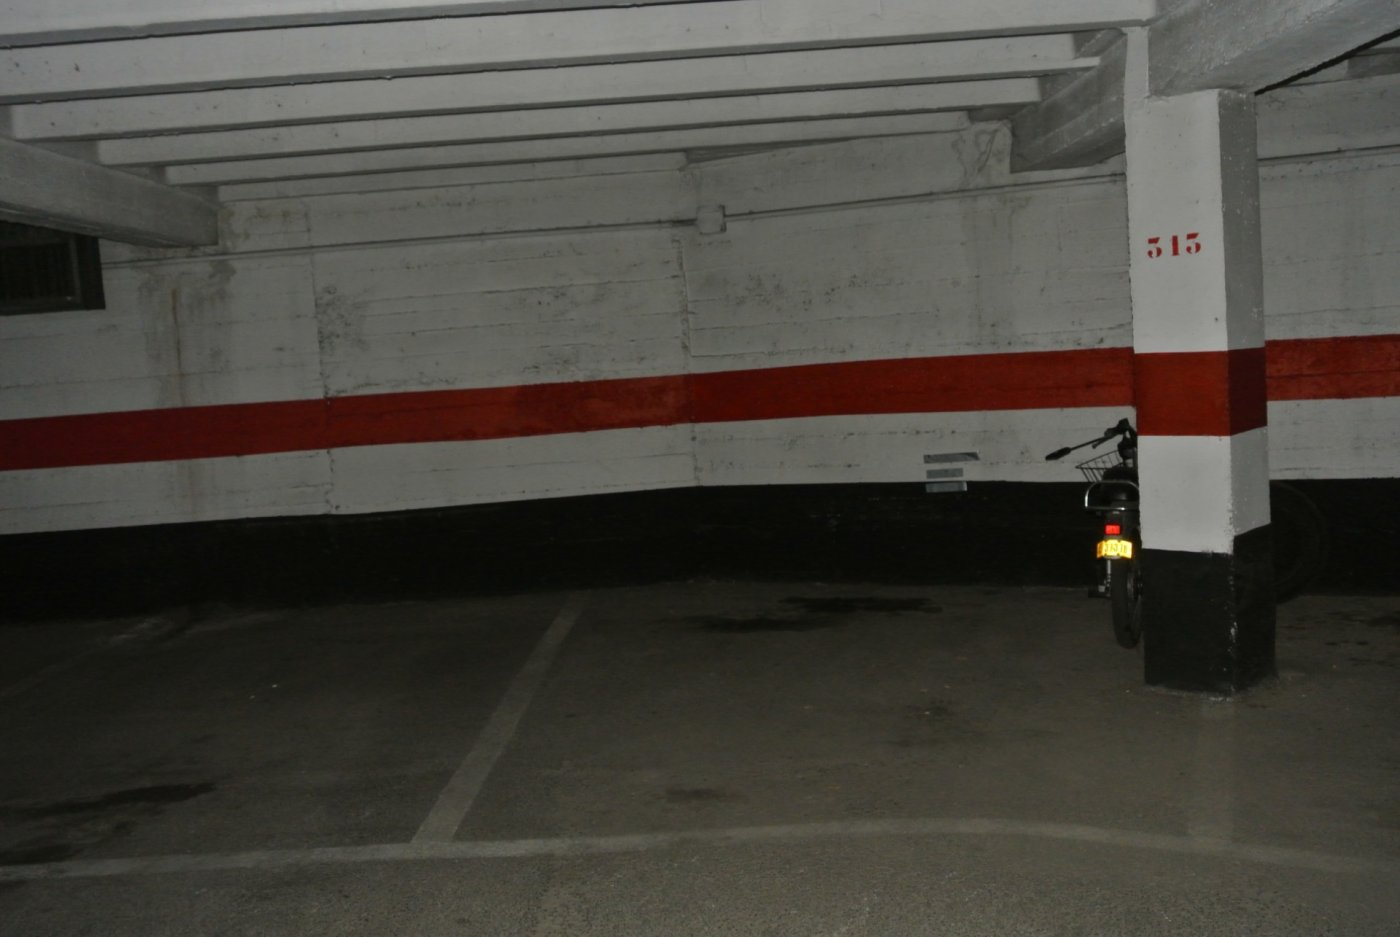 Plaza de garaje en tenor fleta - imagenInmueble3